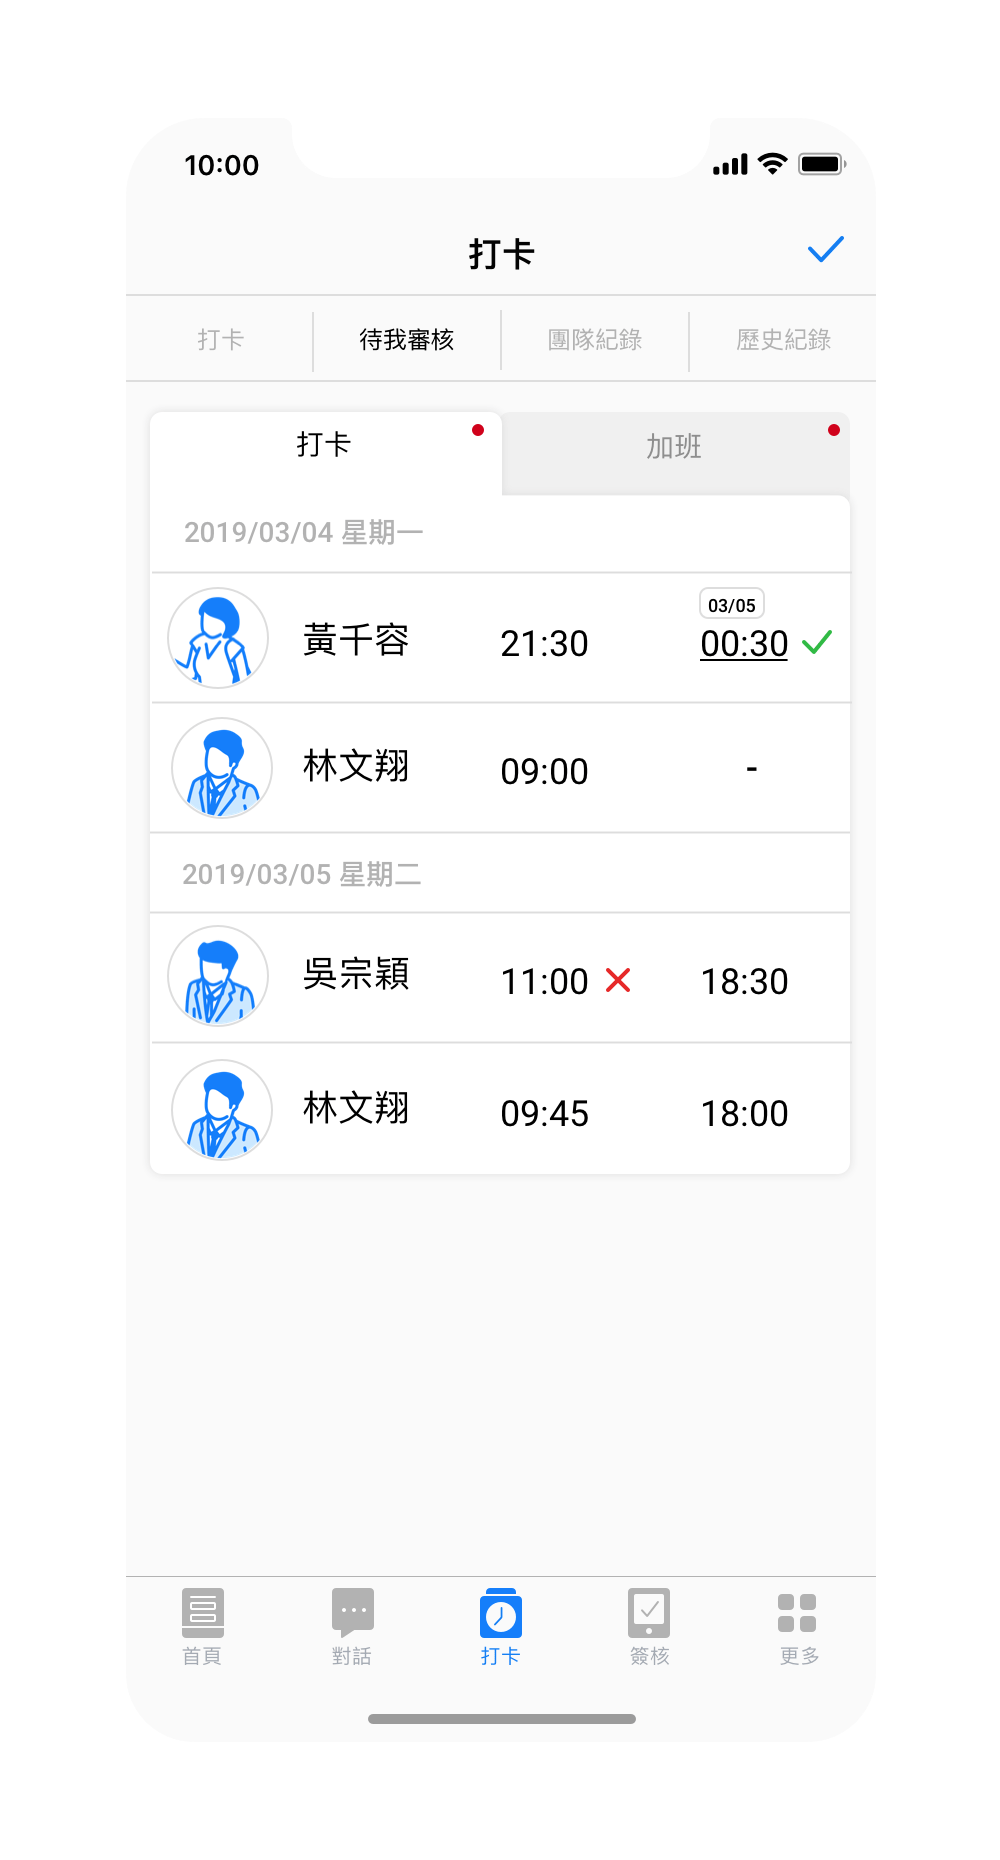 WorkLink 行動商務平臺 - 行動打卡功能介紹